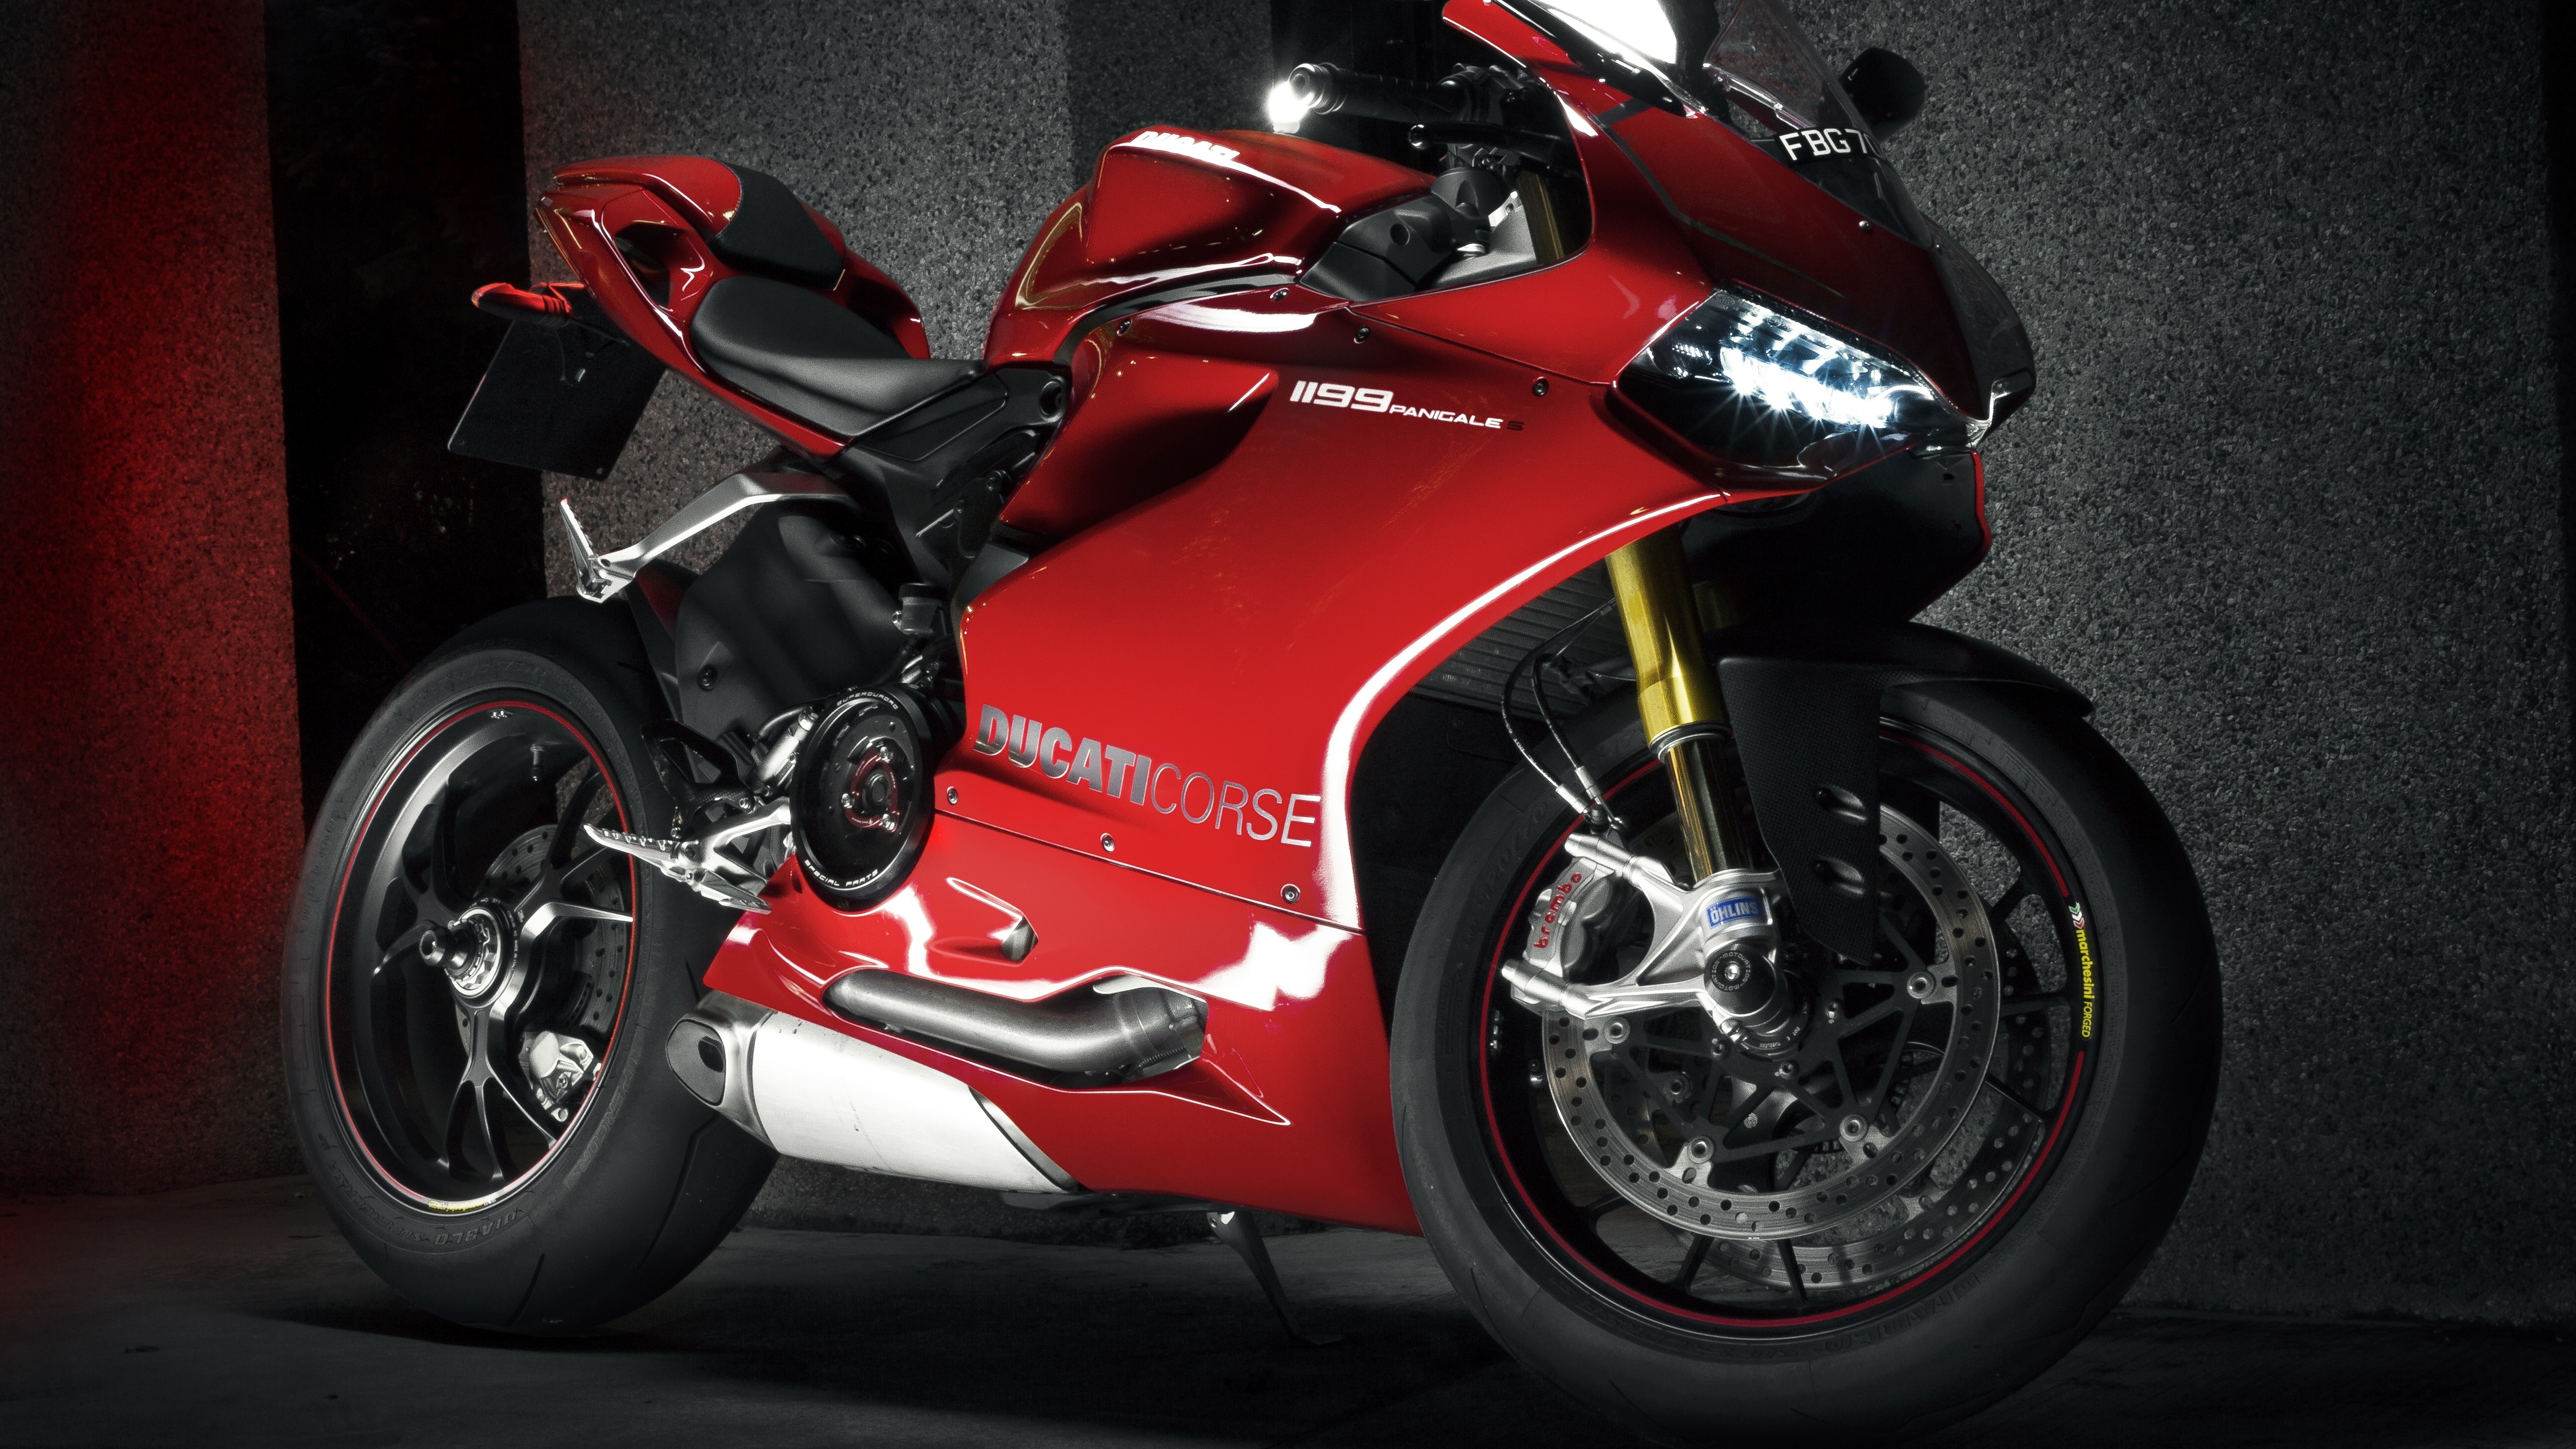 Fondos De Pantalla Ducati 1199 Moto Roja 5120x2880 Uhd 5k Imagen